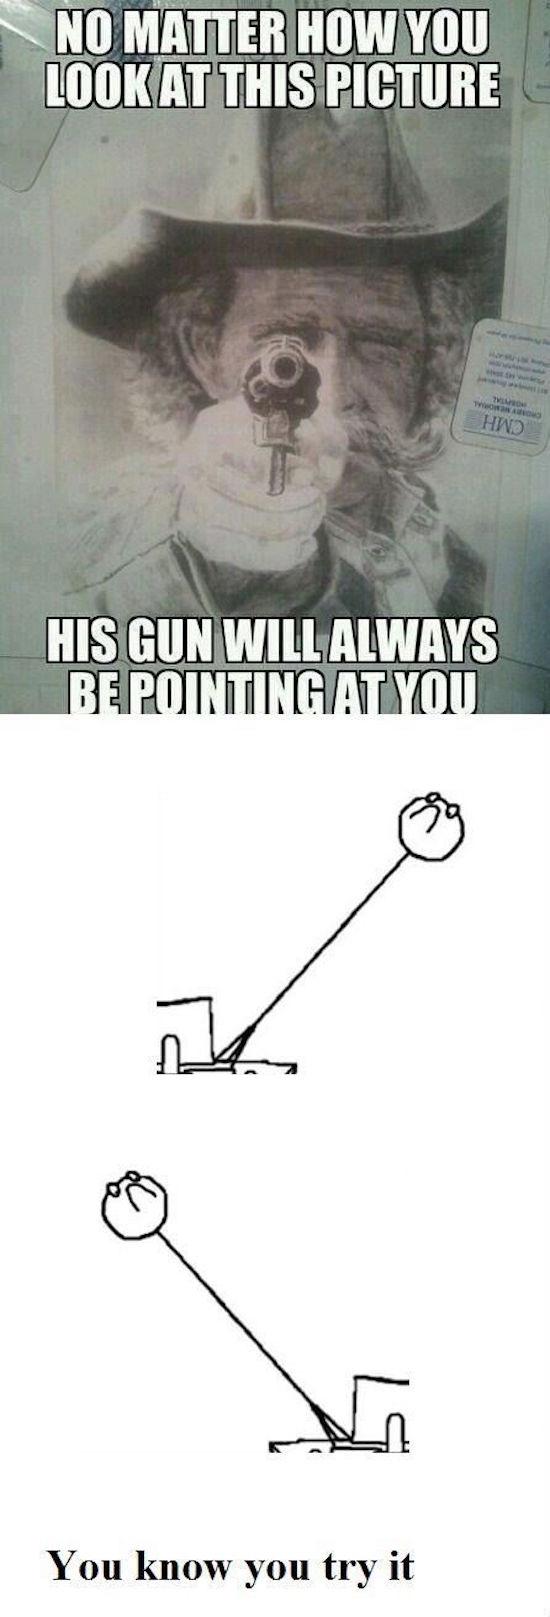 funny photo of guy holding gun that follows you no matter where you move